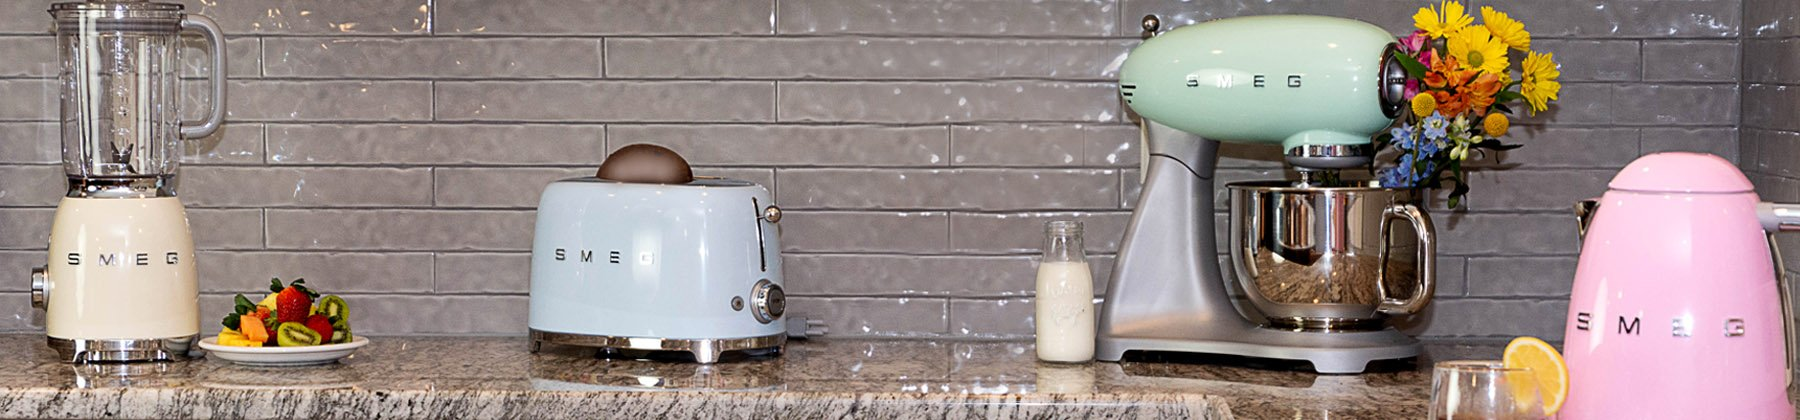 Photo of SMEG stand mixers.